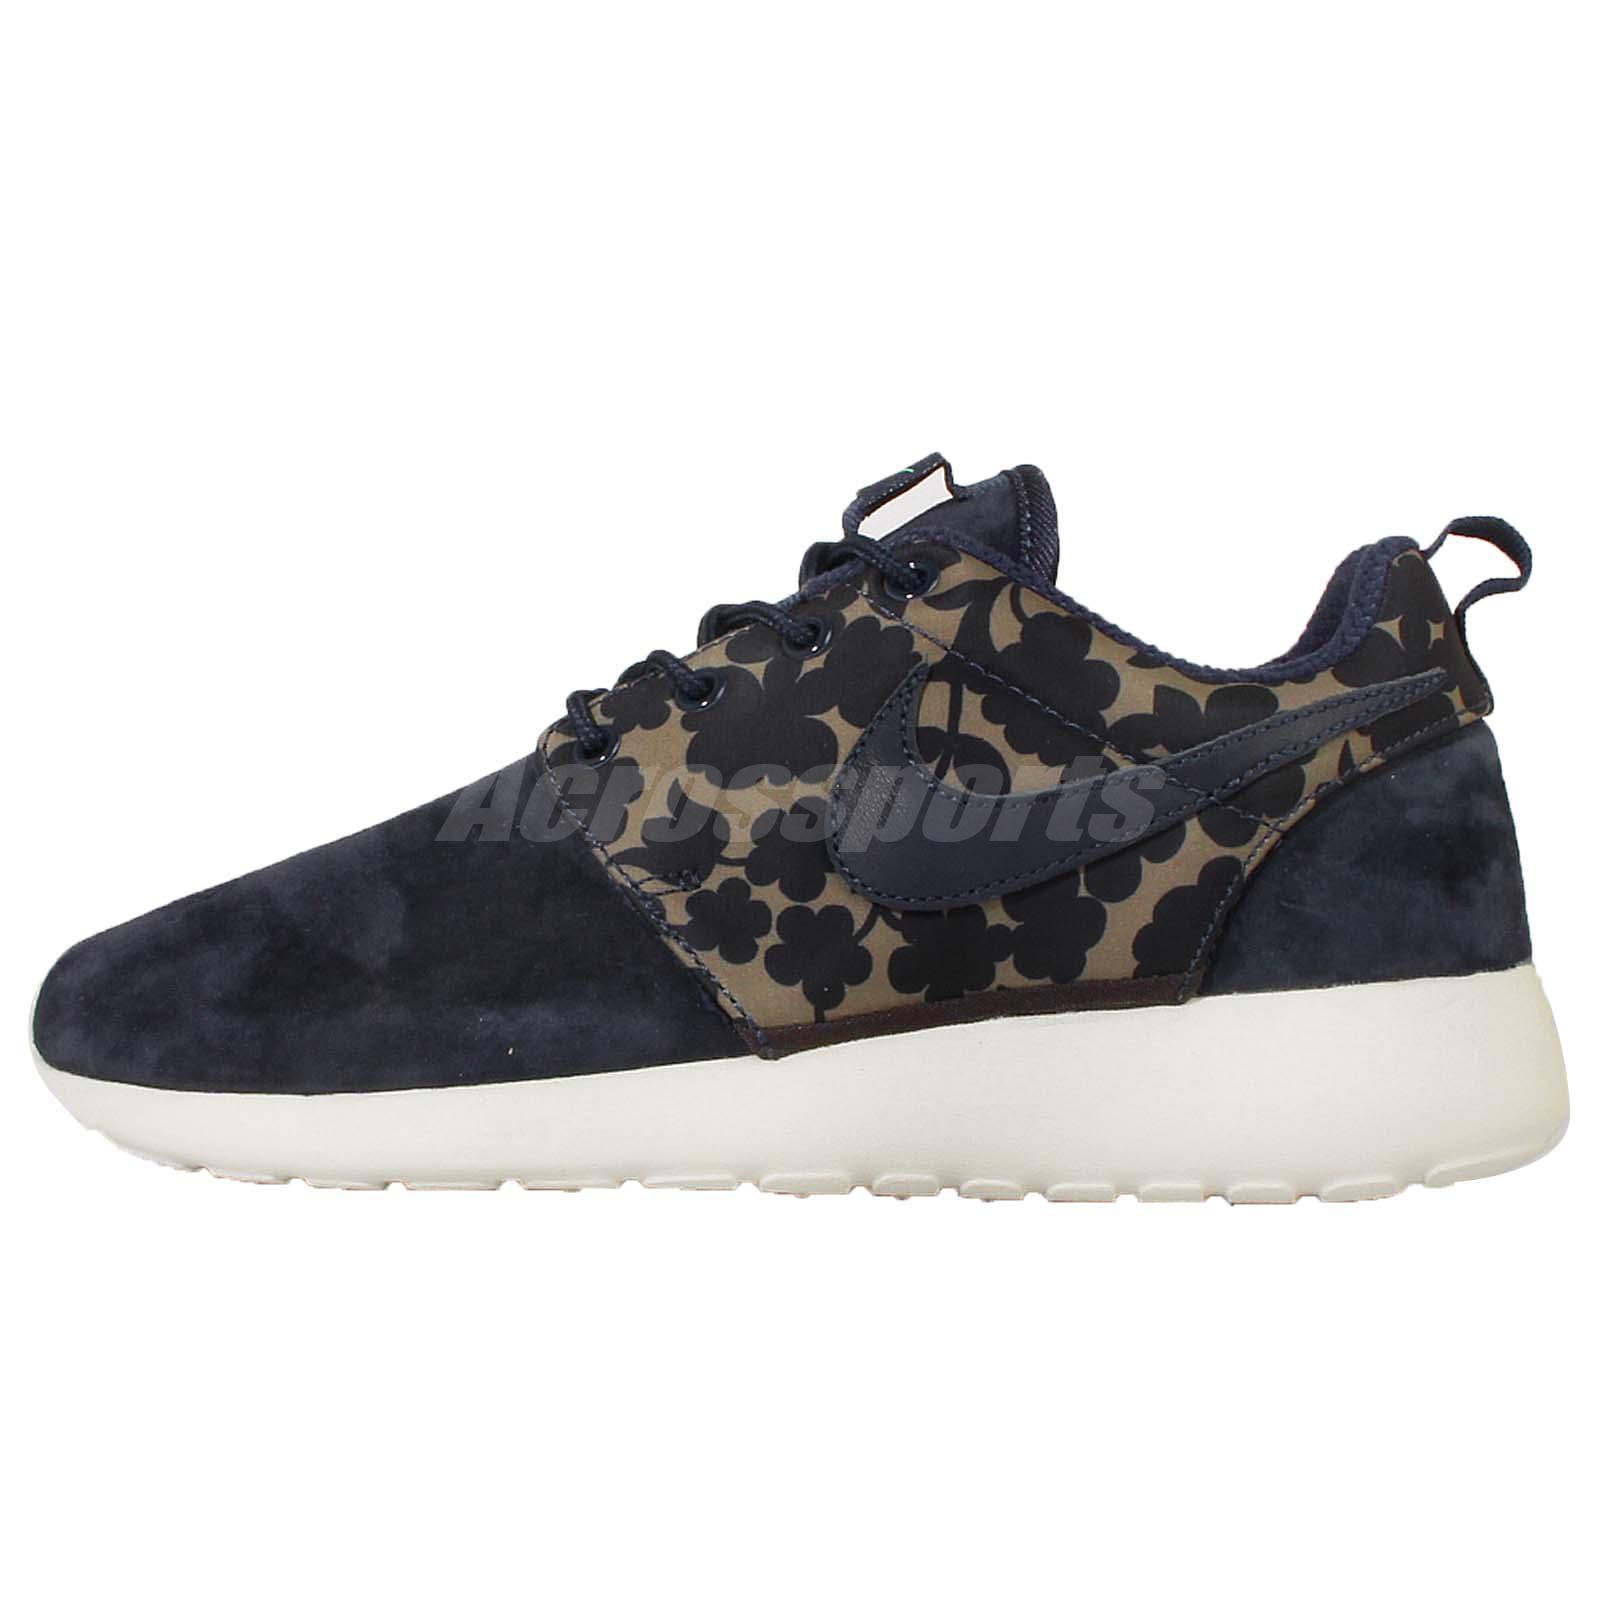 Wmns Nike Roshe One LIB QS Liberty Rosherun Navy Women Running Shoes 654165-300